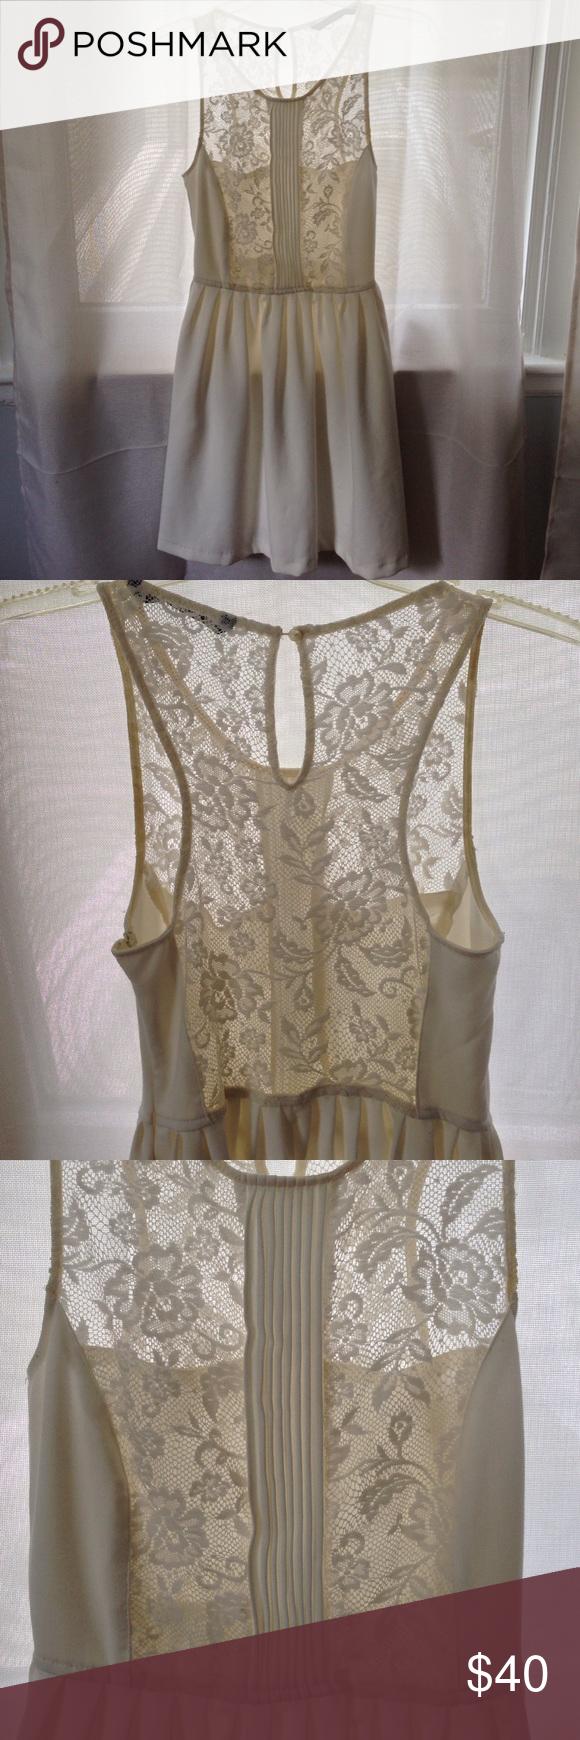 White lace dress zara  Zara uZara Trafalucu White Lace Dress  White lace dresses White